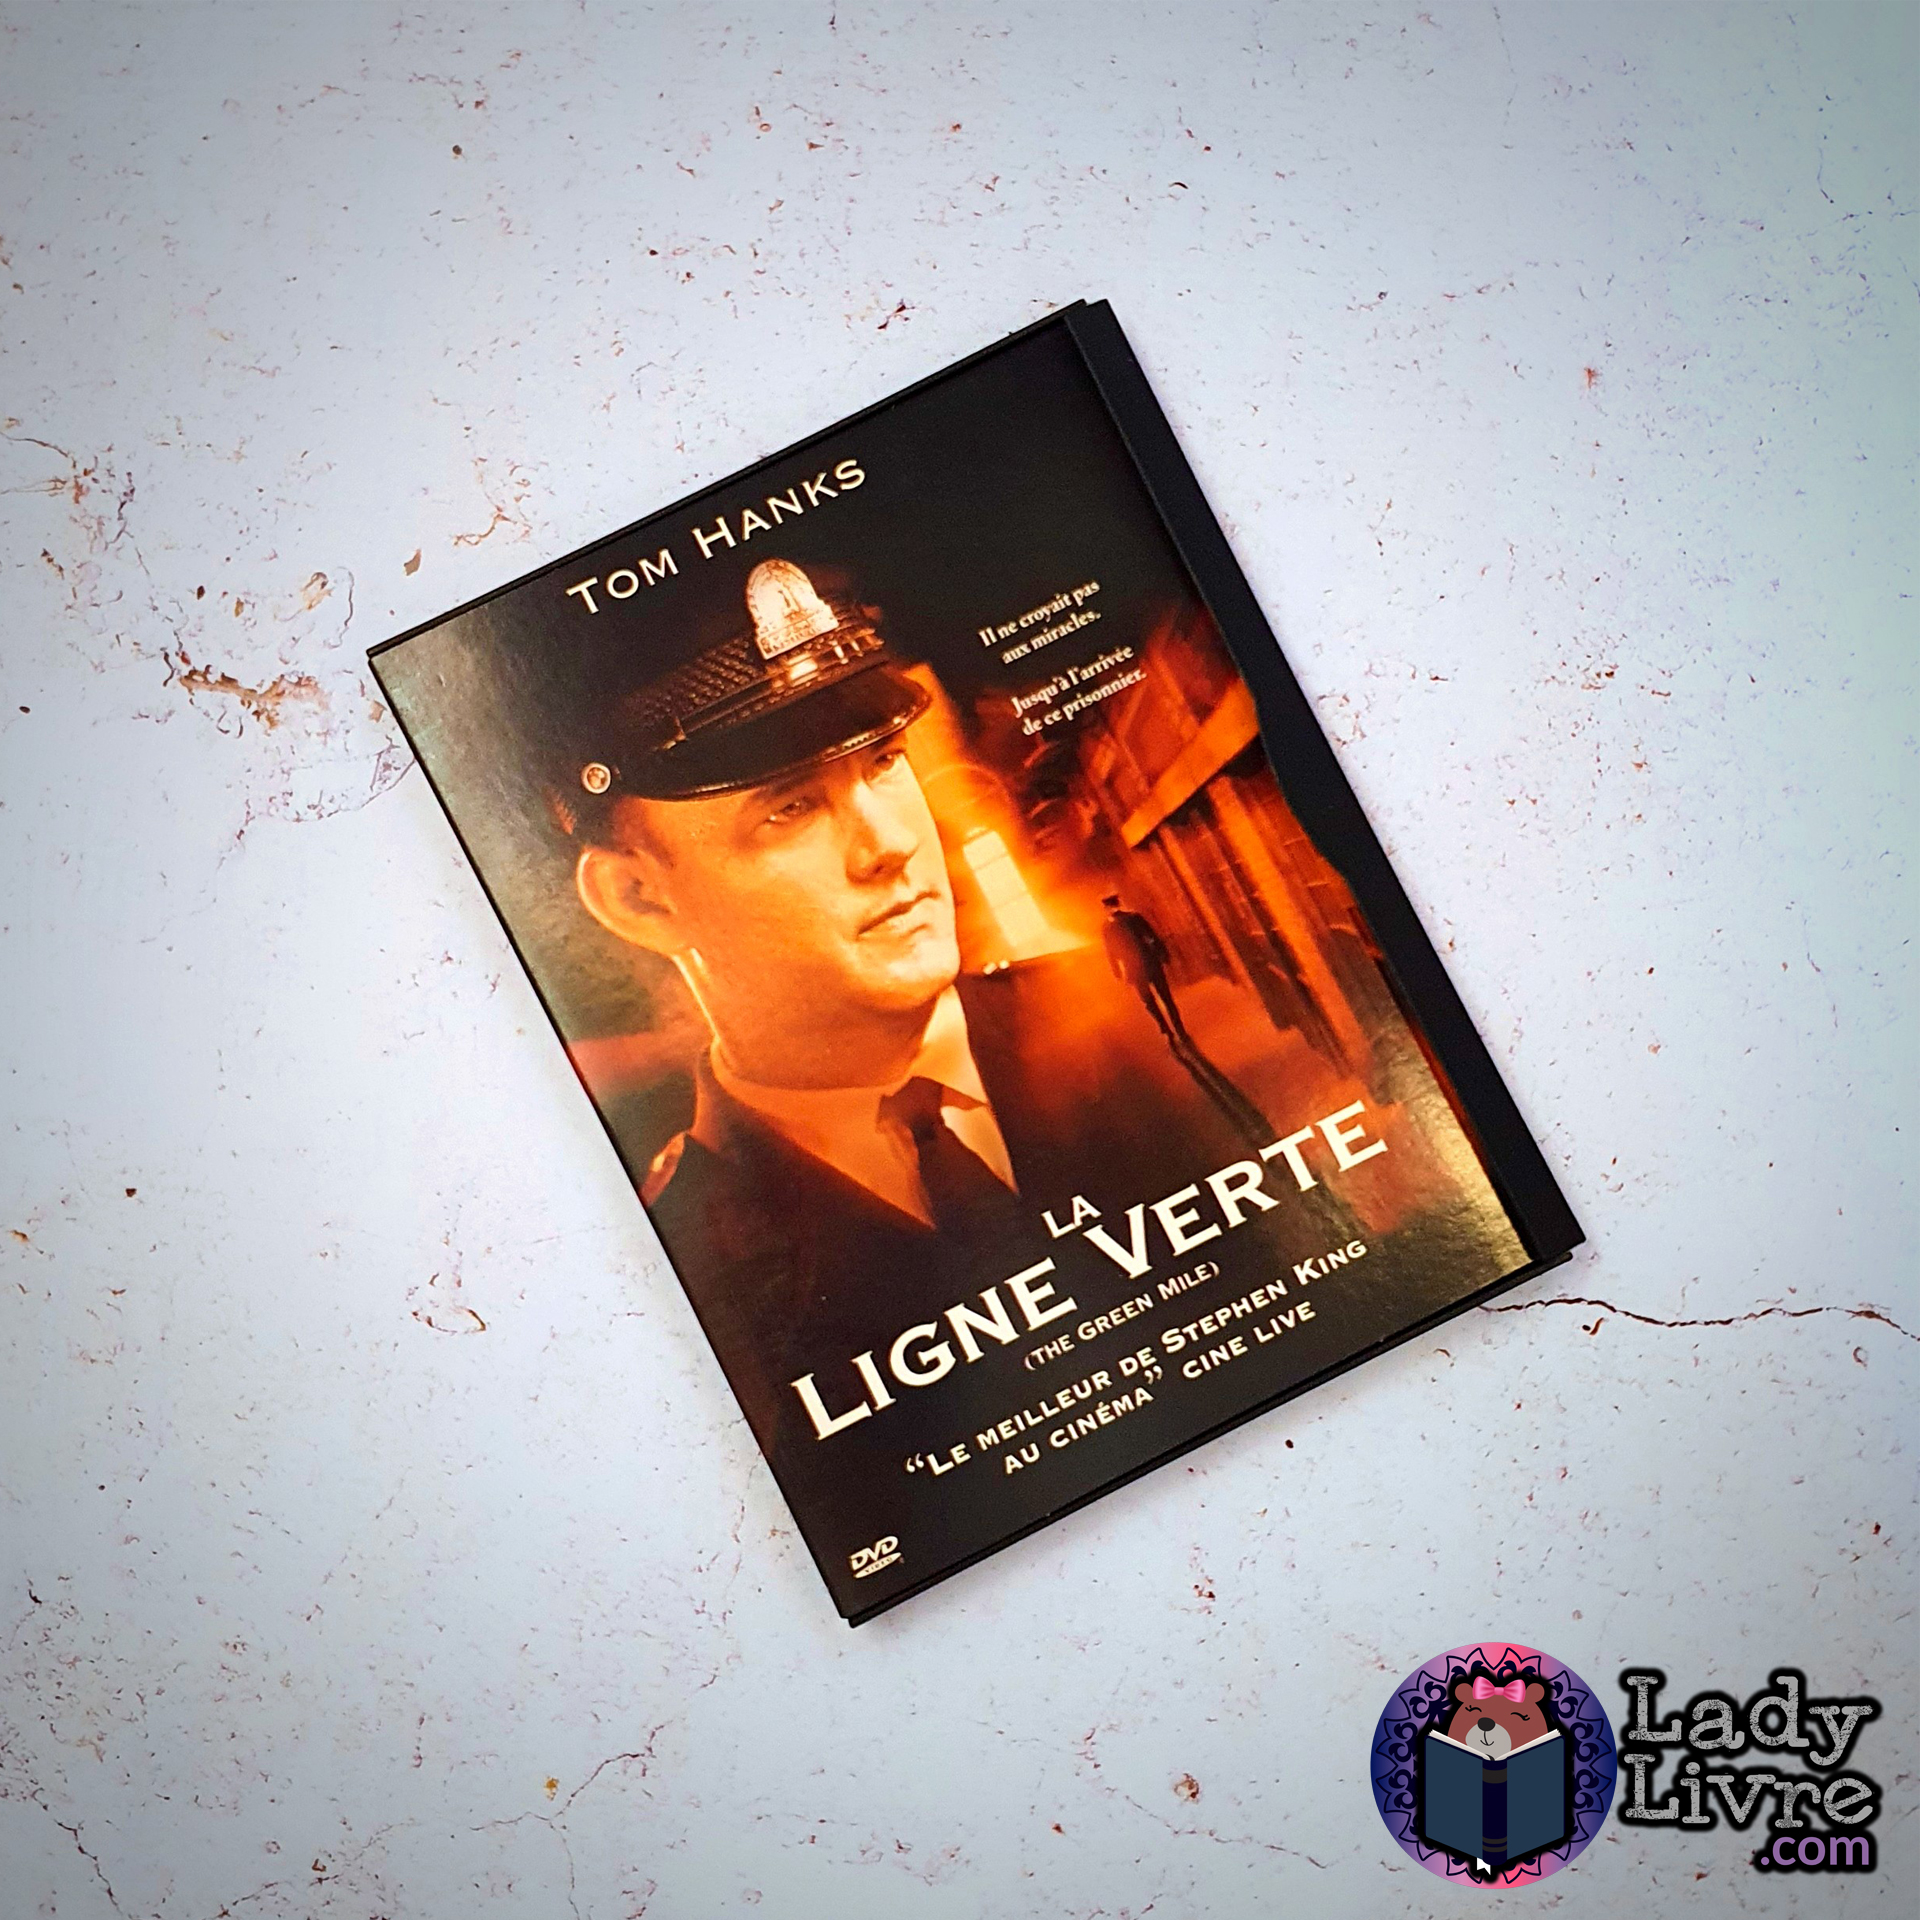 La ligne verte - Stephen King  (DVD)